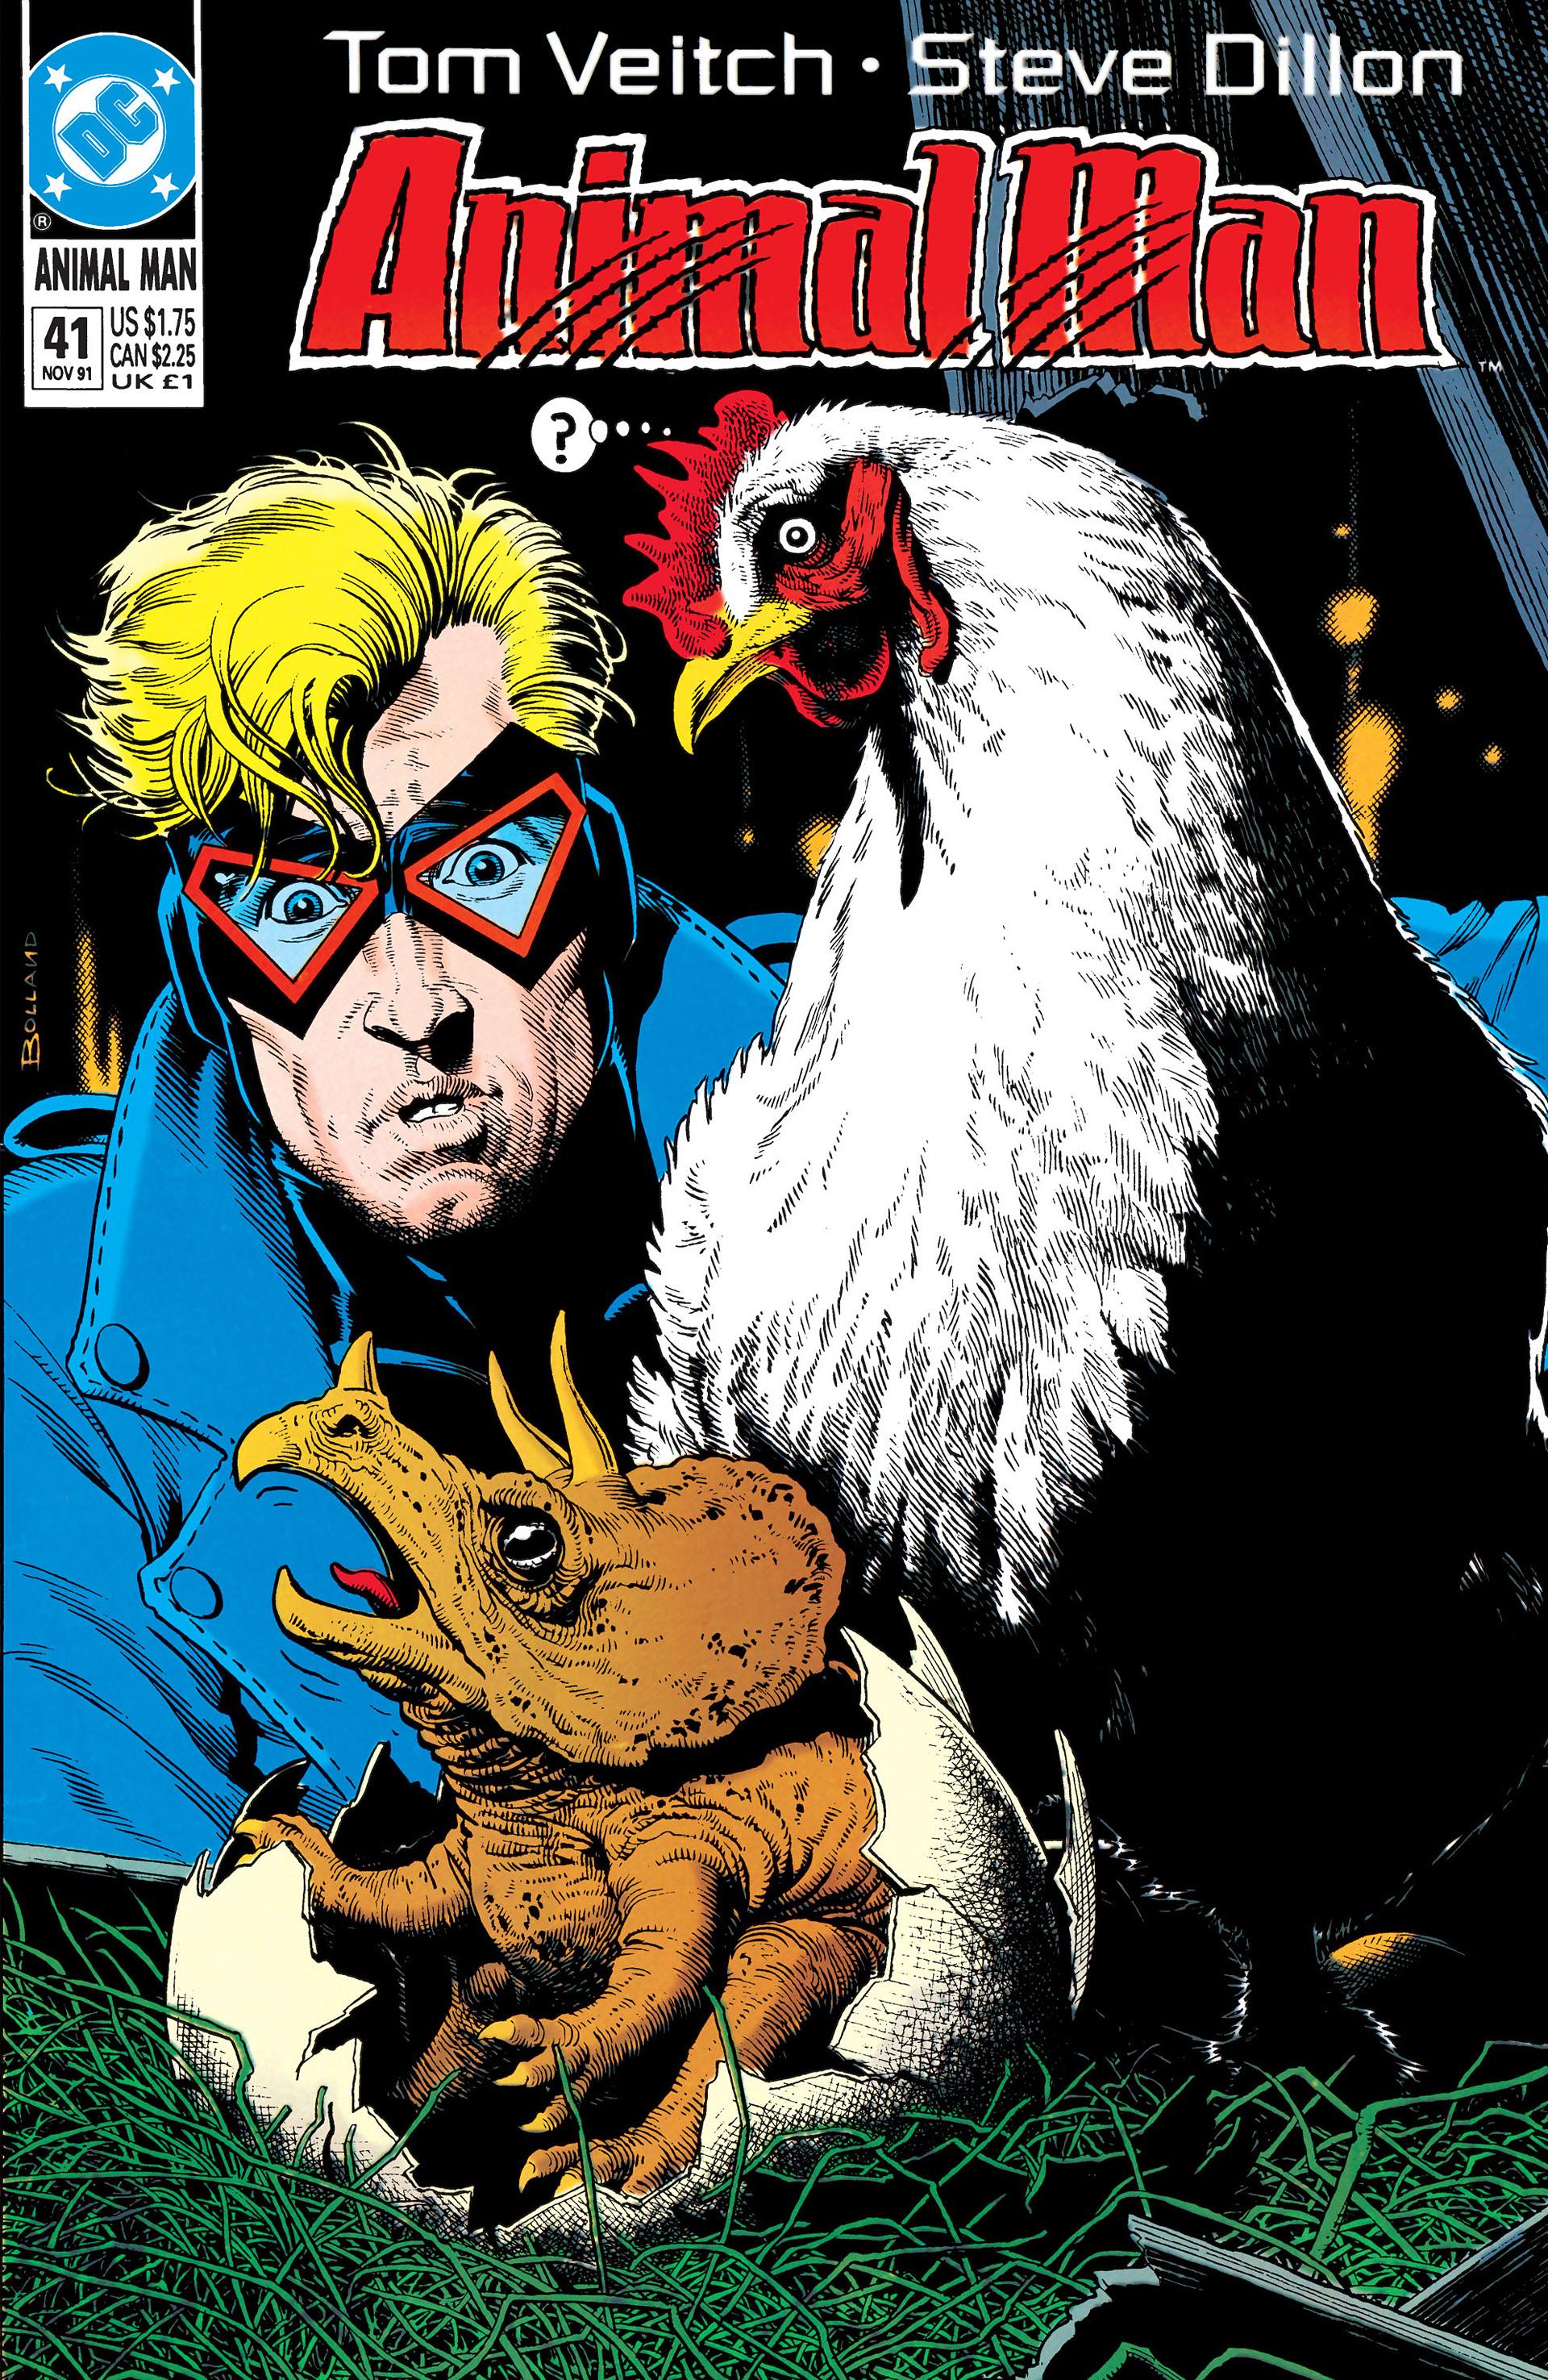 Animal Man (1988) 41 Page 1